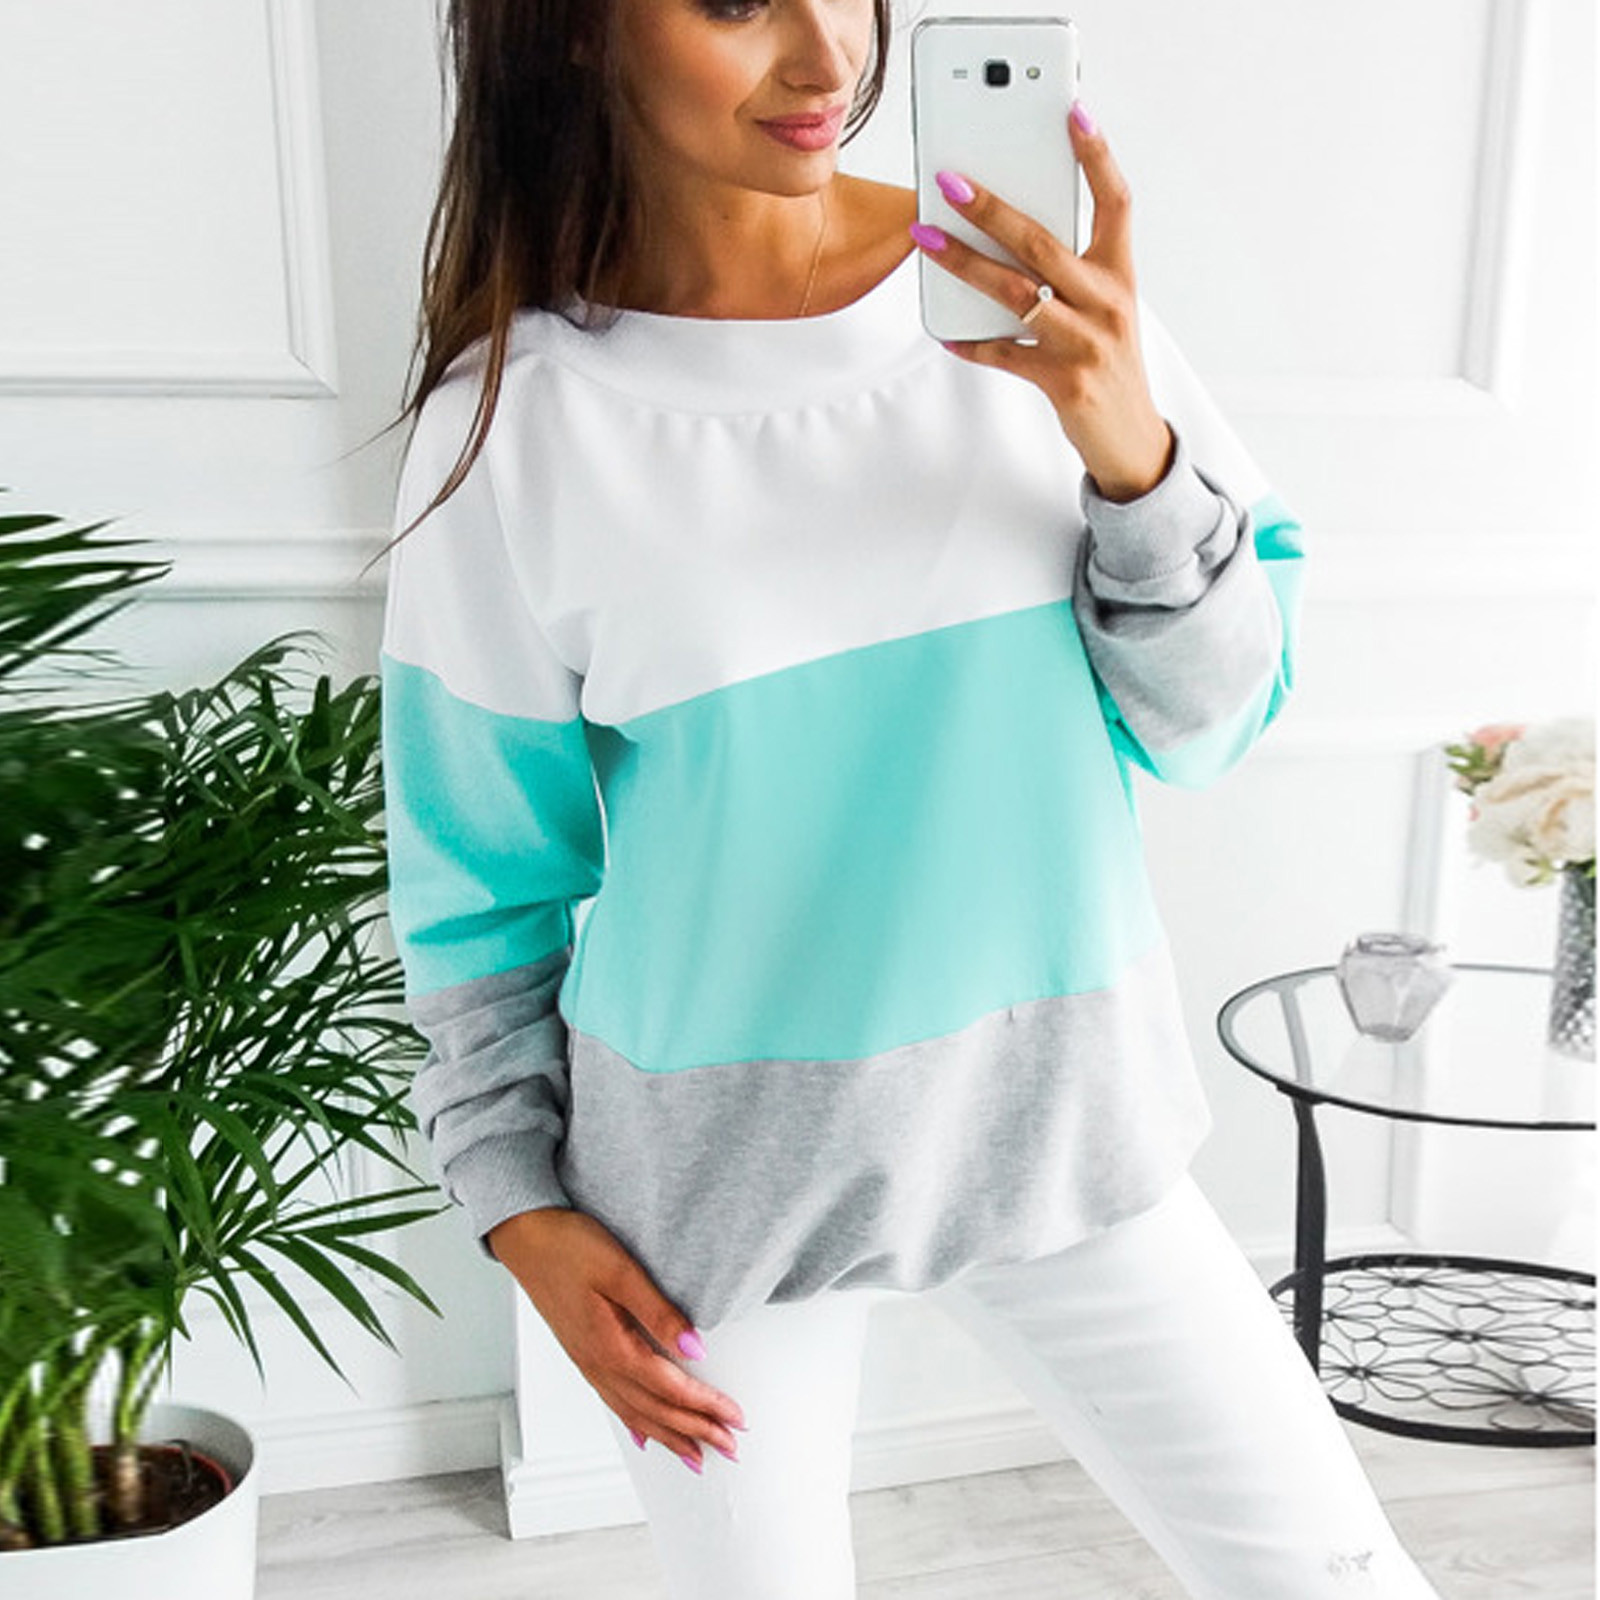 4# Women's Sweaters Stitching Bandage O neck Top Casual Long Sleeve Pull Femme Sweater Sweater Women Winter Свитер Женский